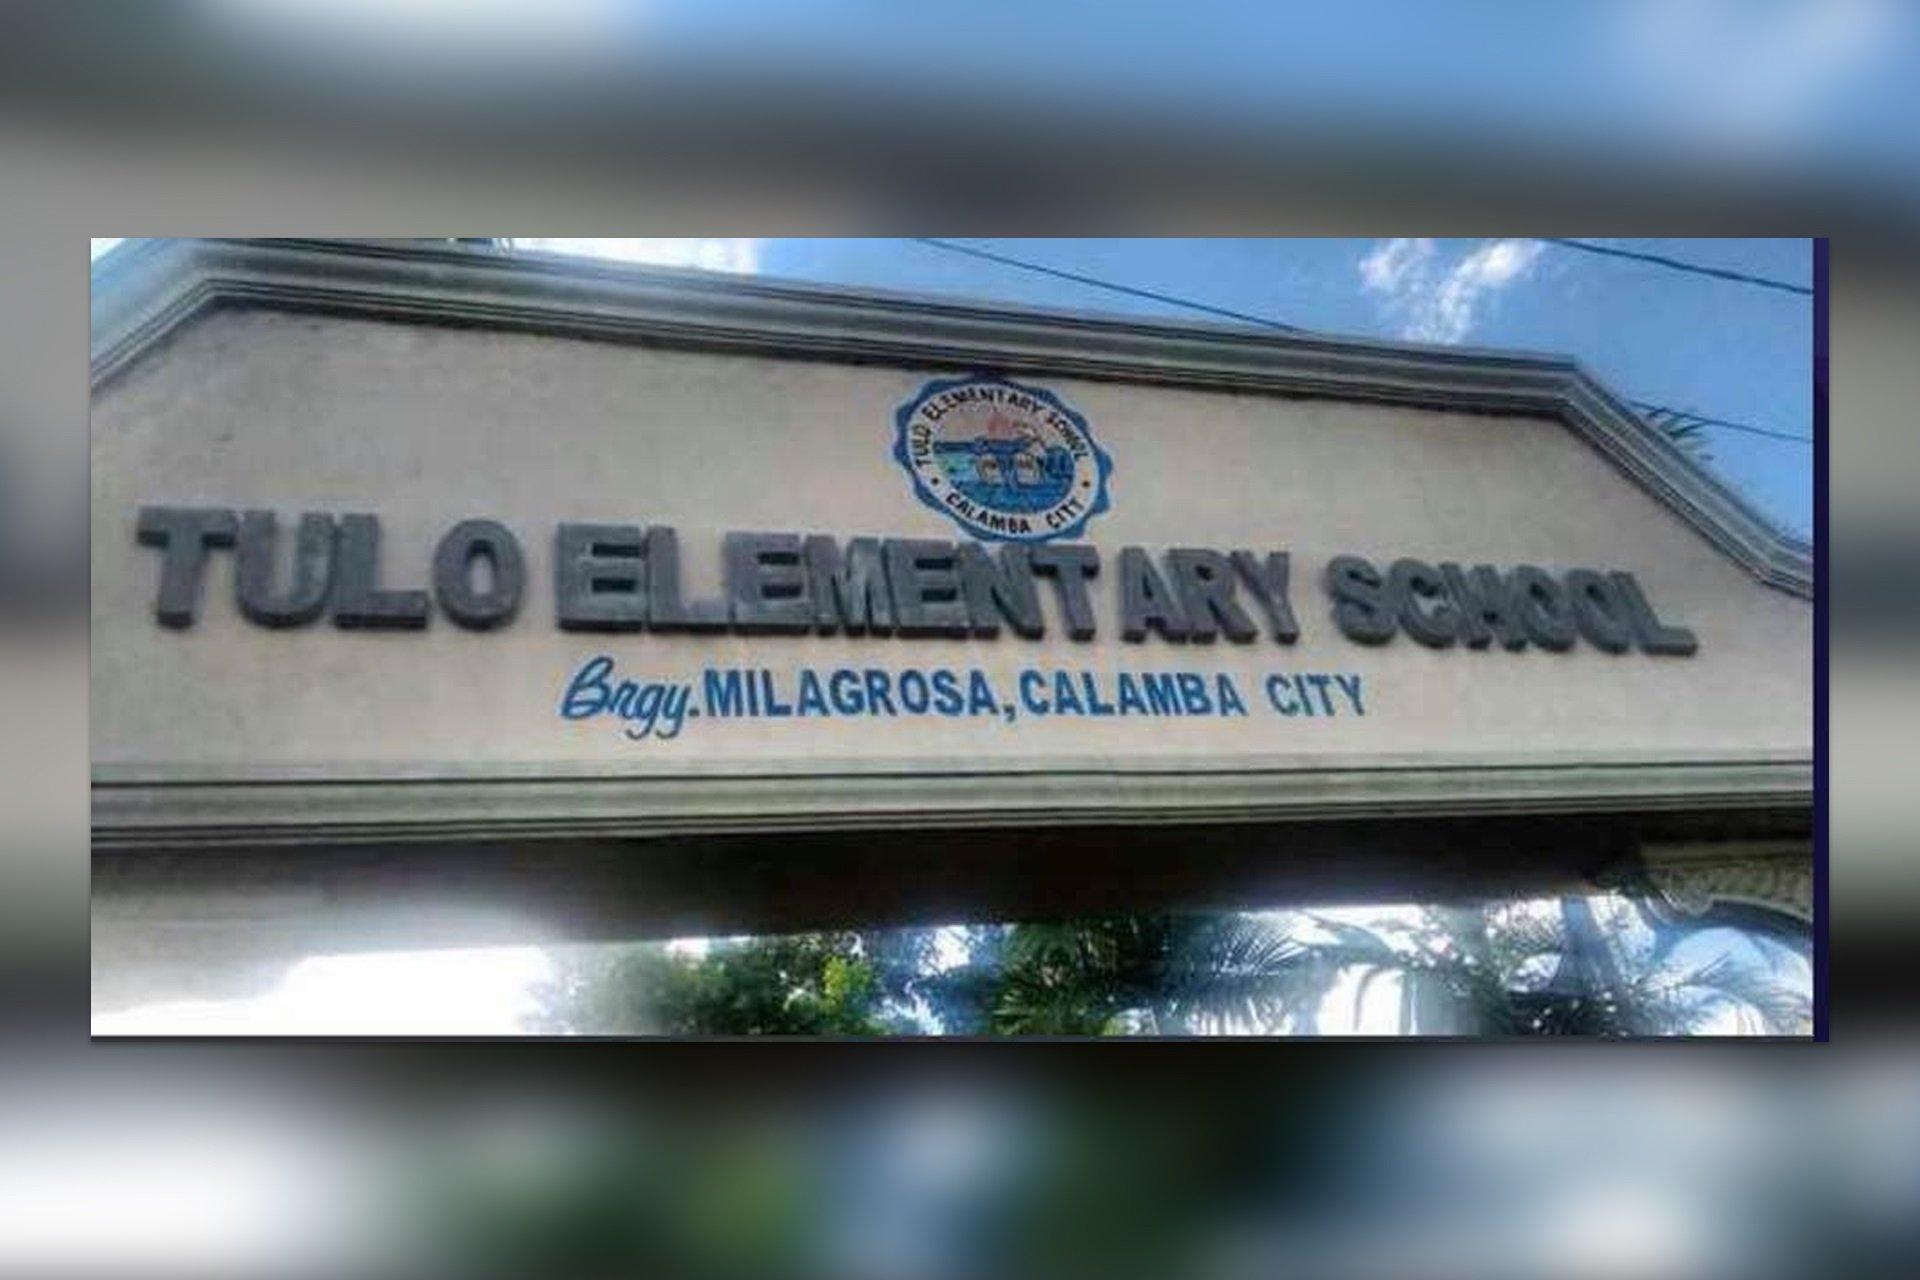 Tulu Elementary School